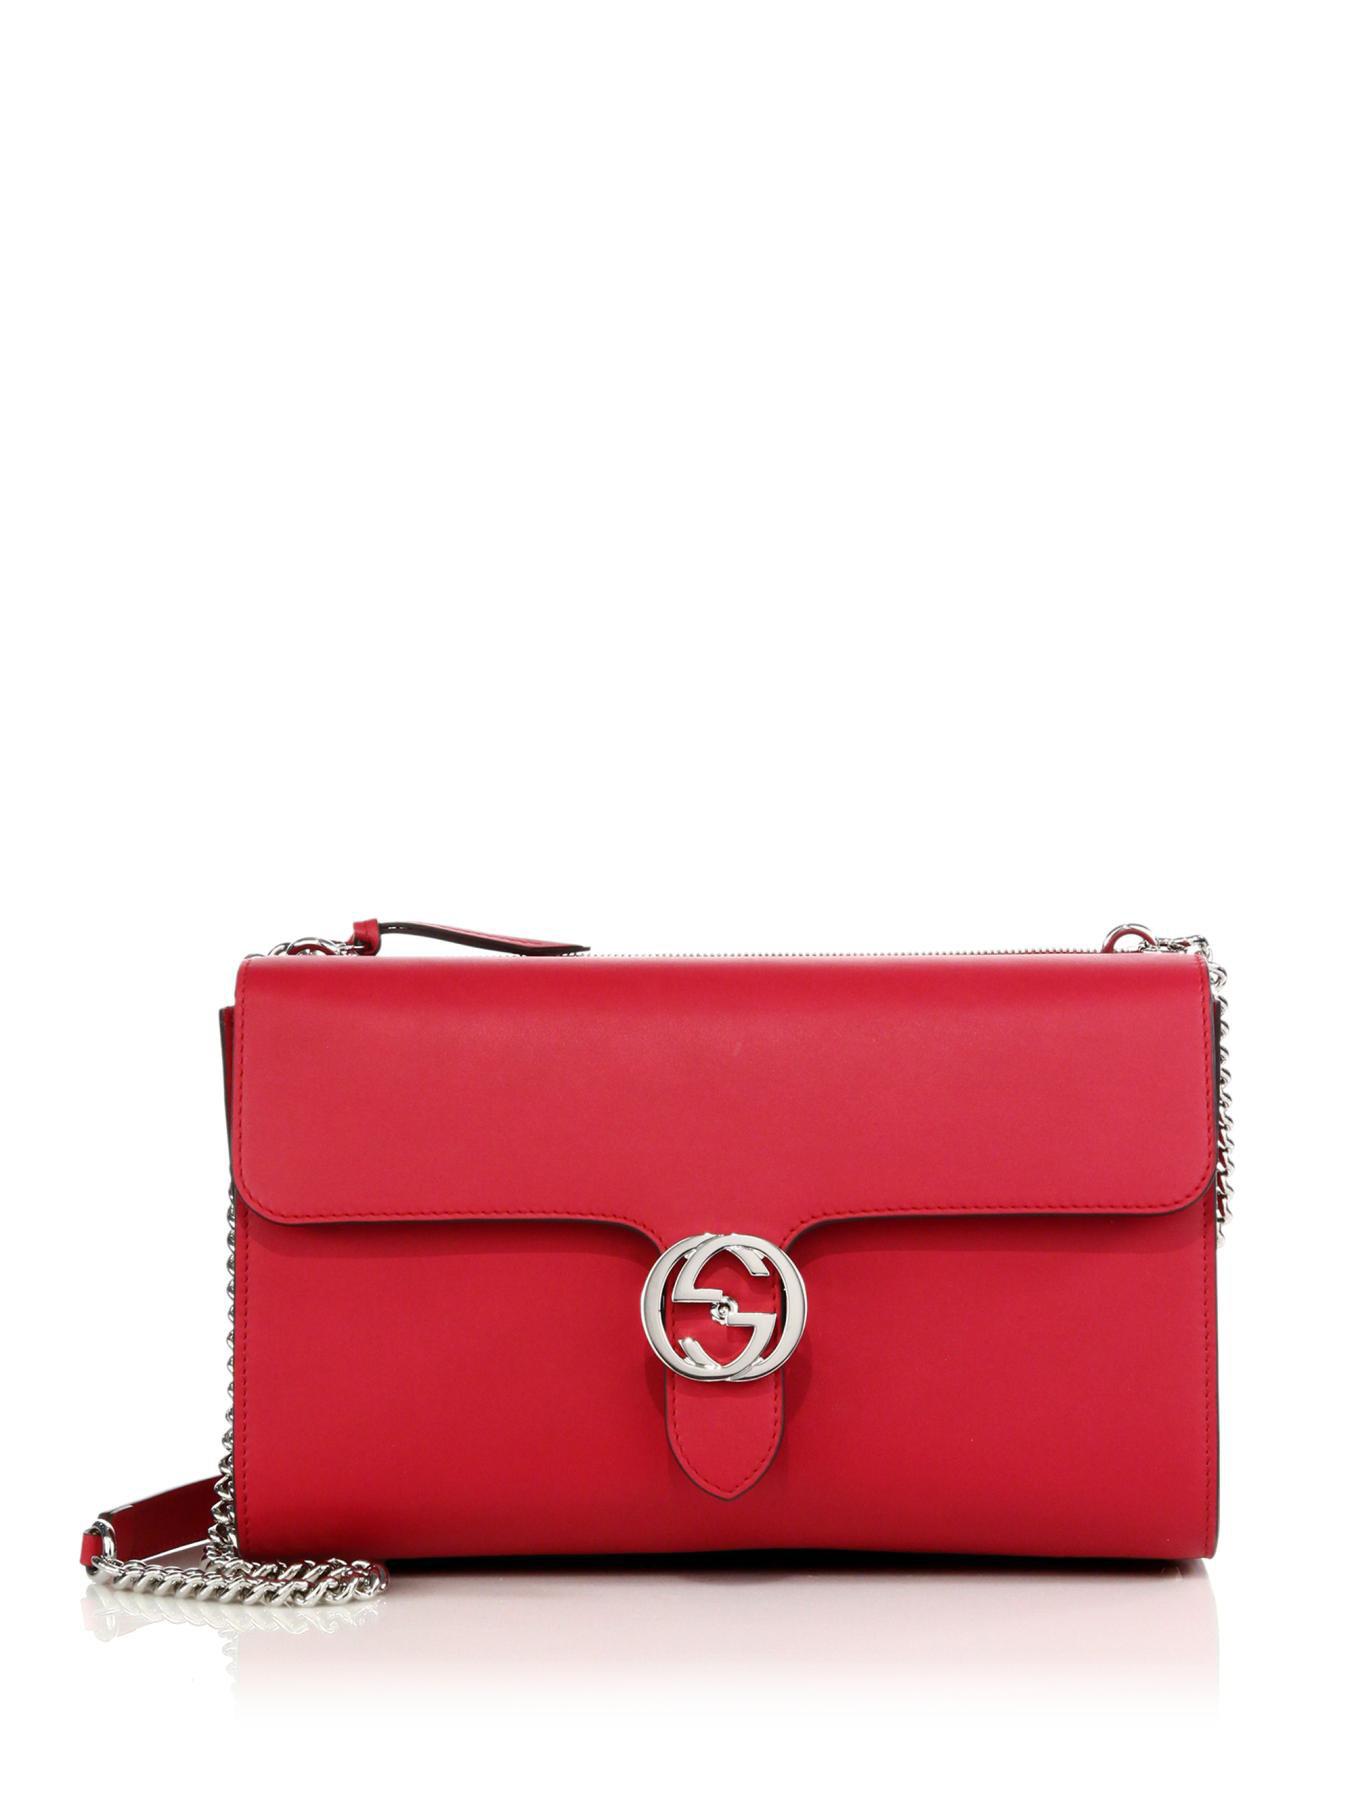 Gucci Interlocking Leather Shoulder Bag In Red Lyst